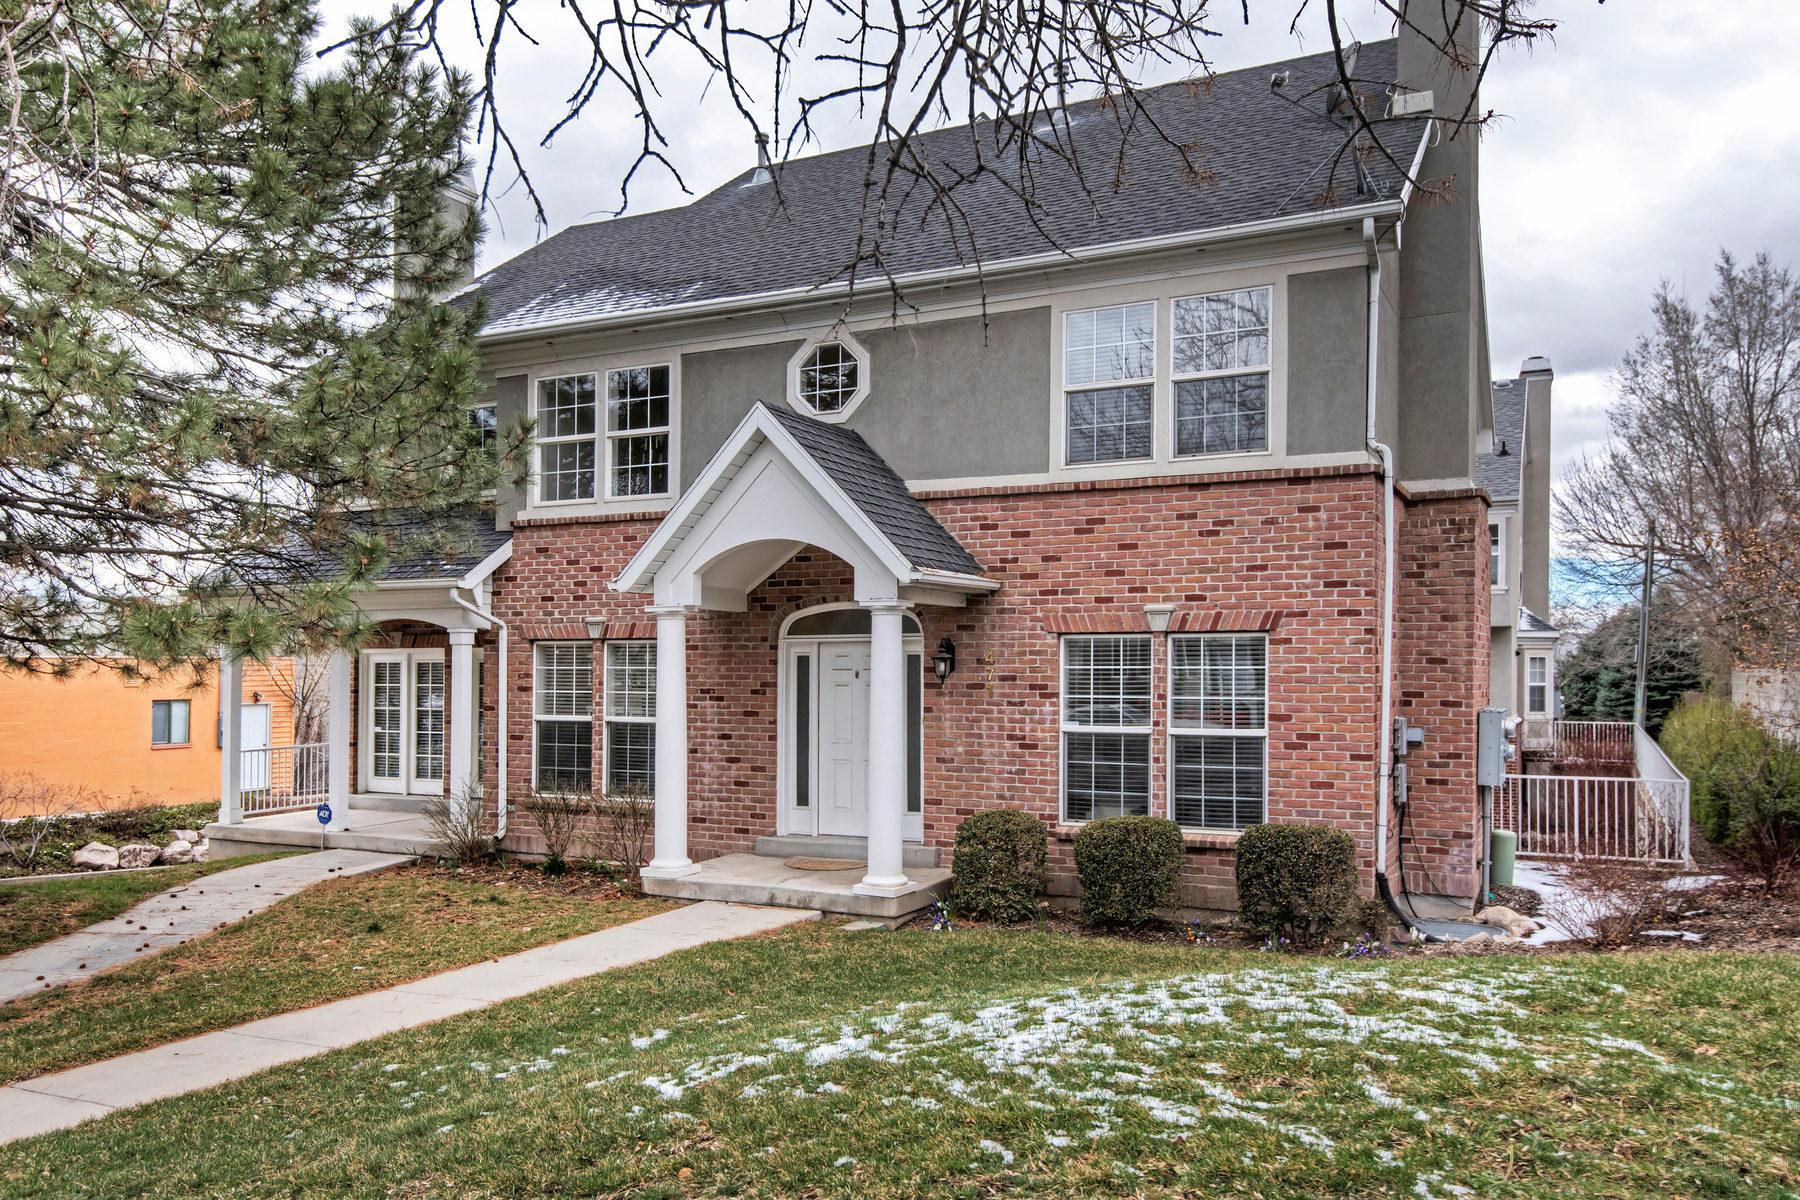 联栋屋 为 销售 在 Impeccable Home No Stone Left Unturned 471 N E St 盐湖城市, 犹他州, 84103 美国